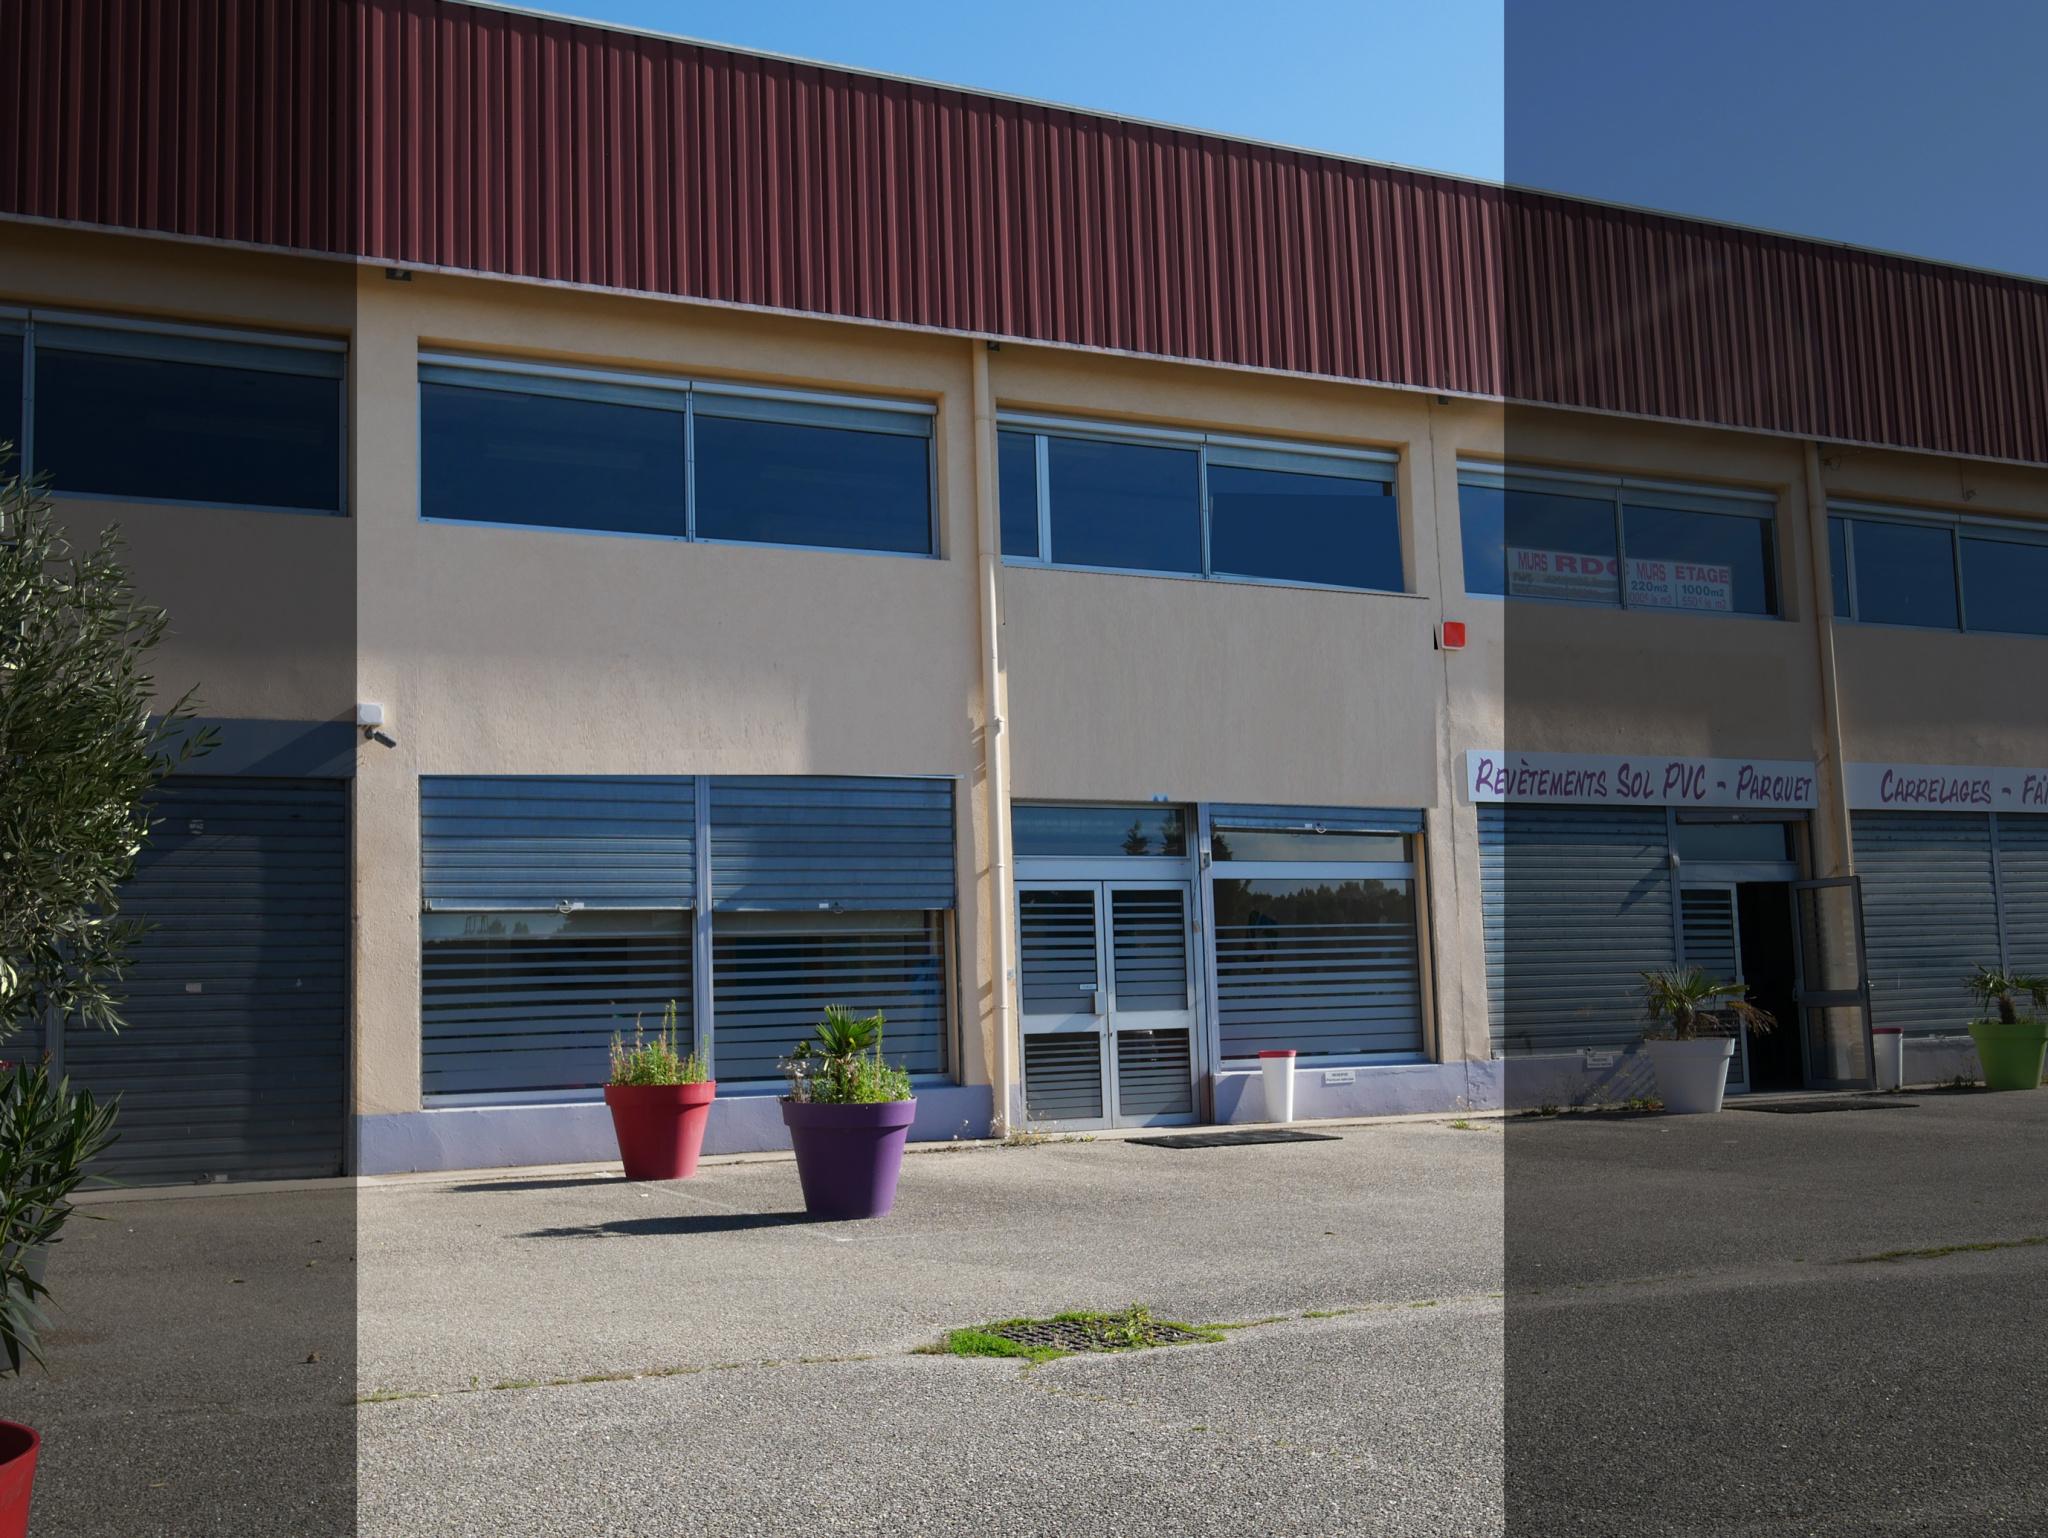 Local d'activité_Bureaux 254400 38110 Rochetoirin